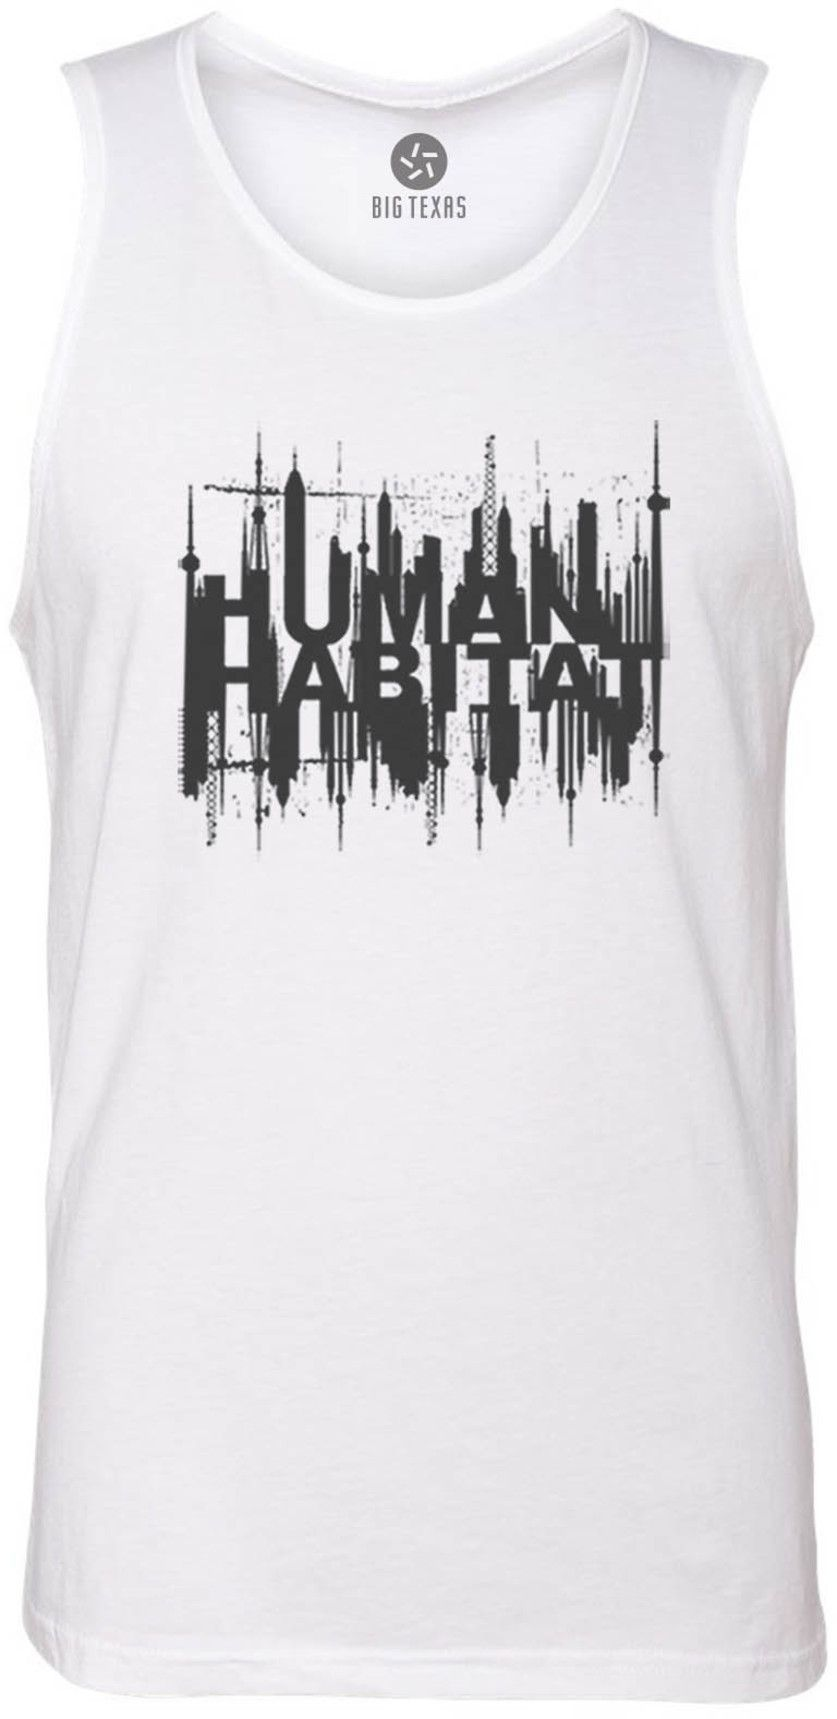 Human Habitiat (Grey) Tank-Top T-Shirt